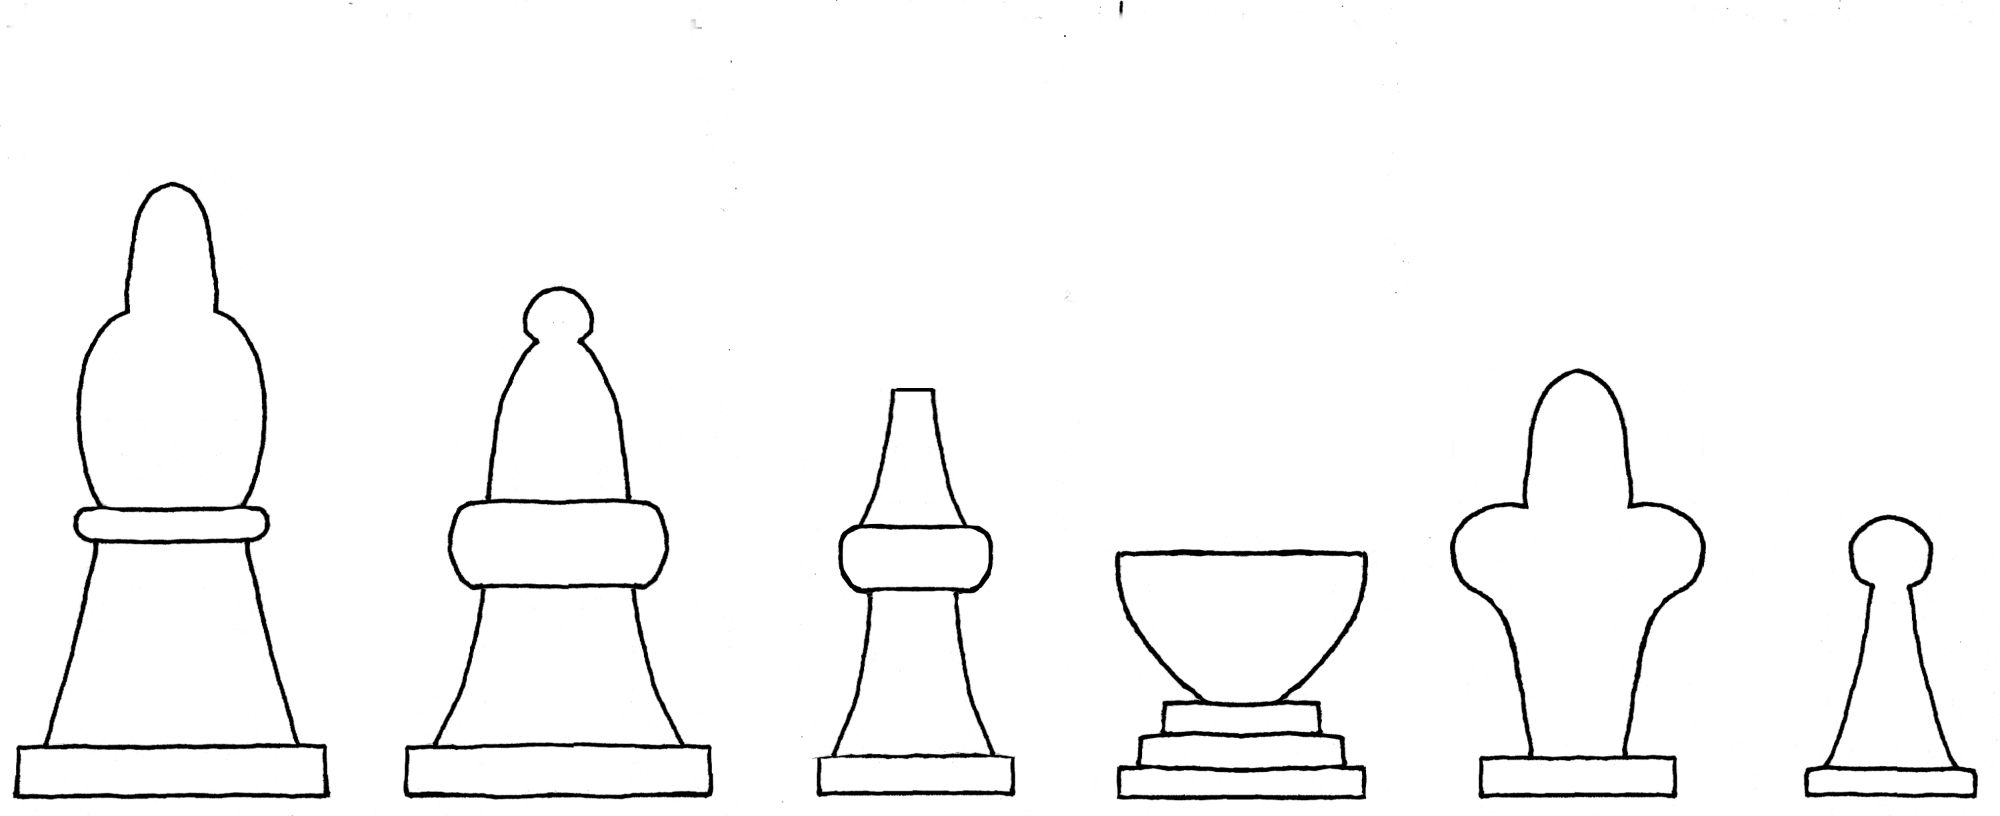 Interpretive diagram of fifteenth century Cessolis chess set